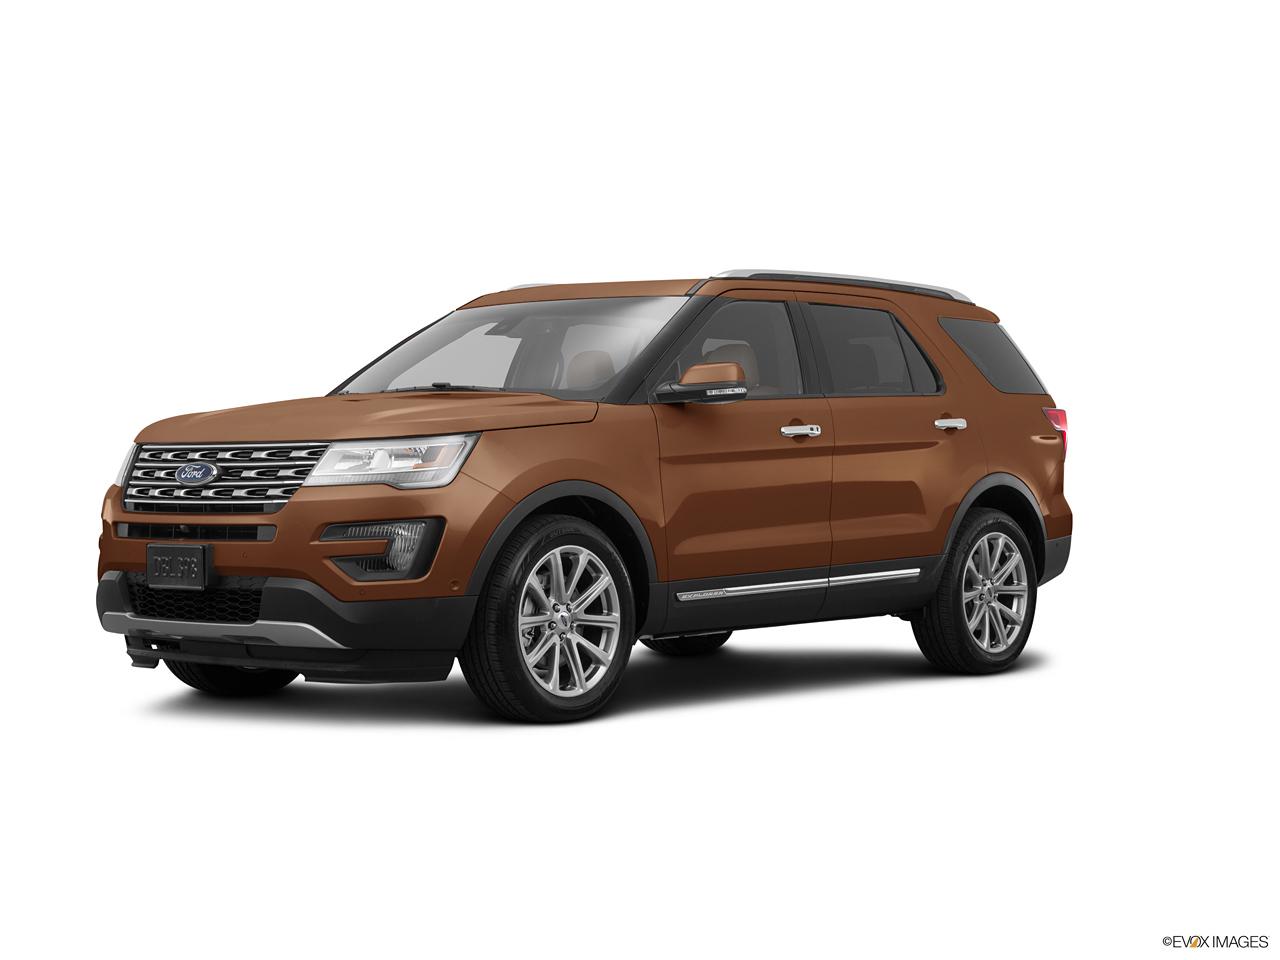 ford explorer 2017 3 5l v6 ltd awd full option in bahrain new car prices specs reviews. Black Bedroom Furniture Sets. Home Design Ideas